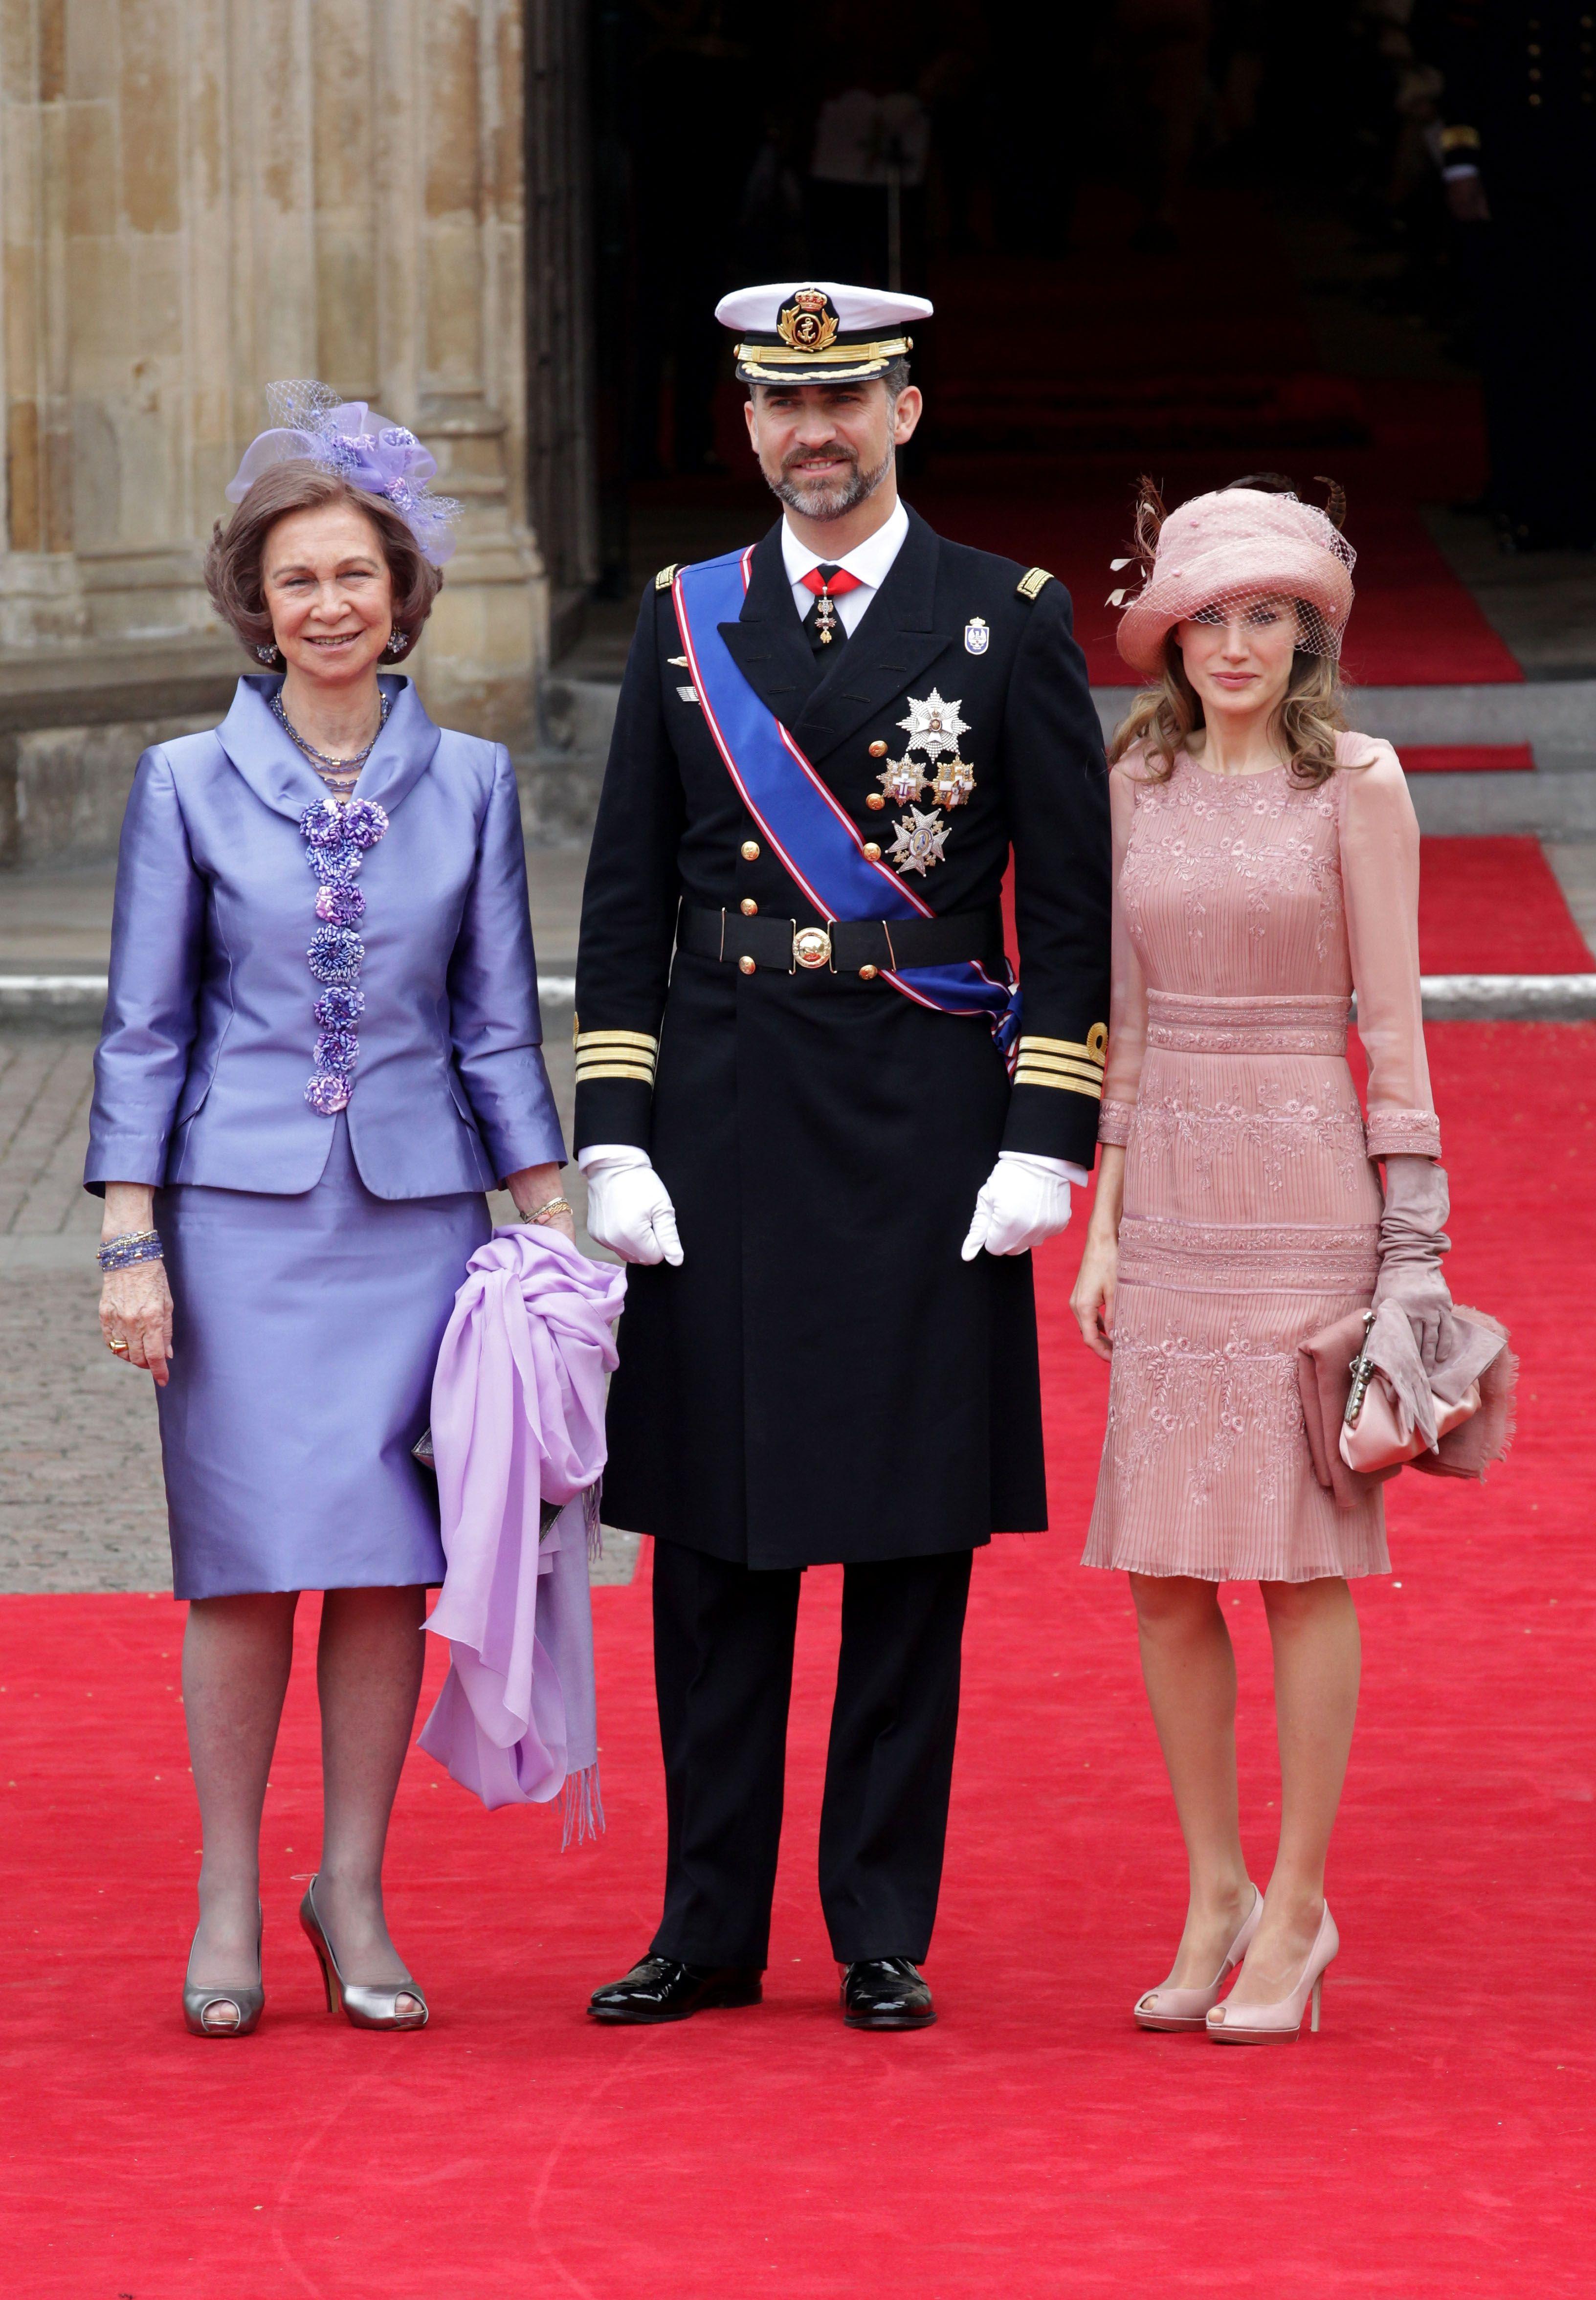 Meghan Markle Prince Harry Royal Wedding Guest List - 31 Celebs ...